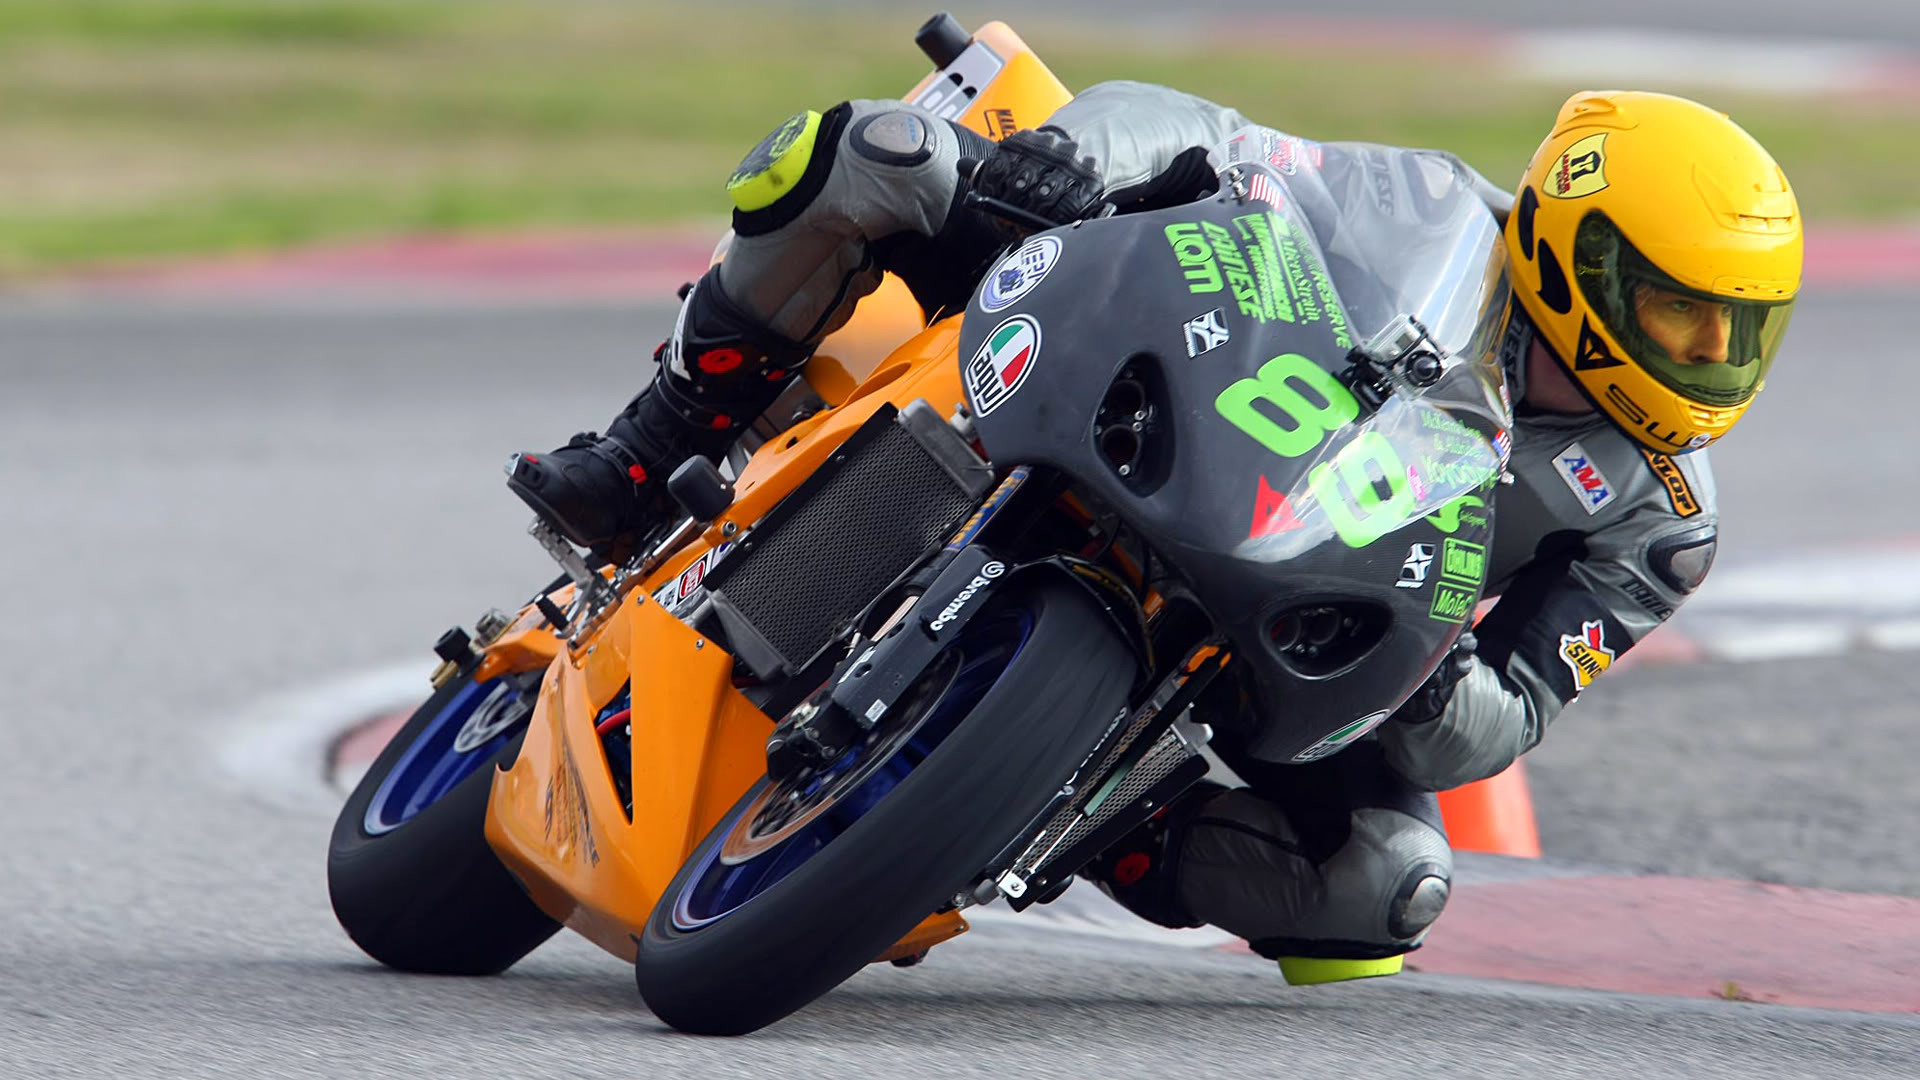 superbike racing wallpapers 183��